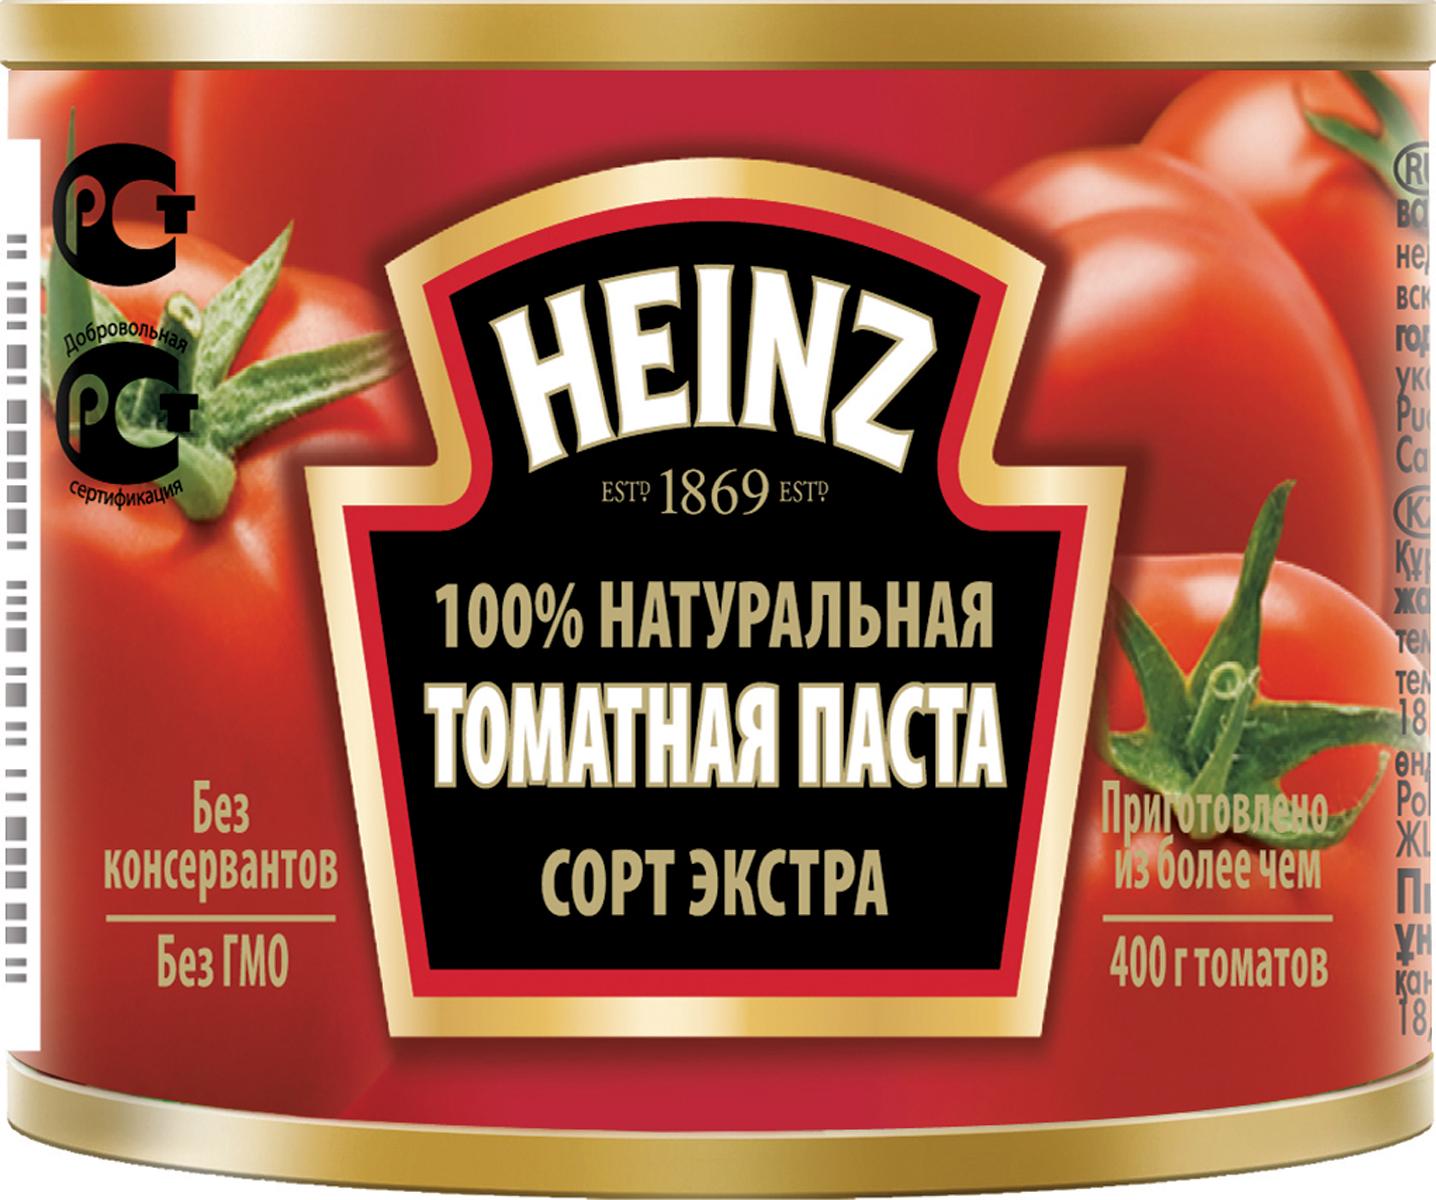 Heinz томатная паста, 70 г romeo rossi паста яичная 4 яйца строцапрети 500 г